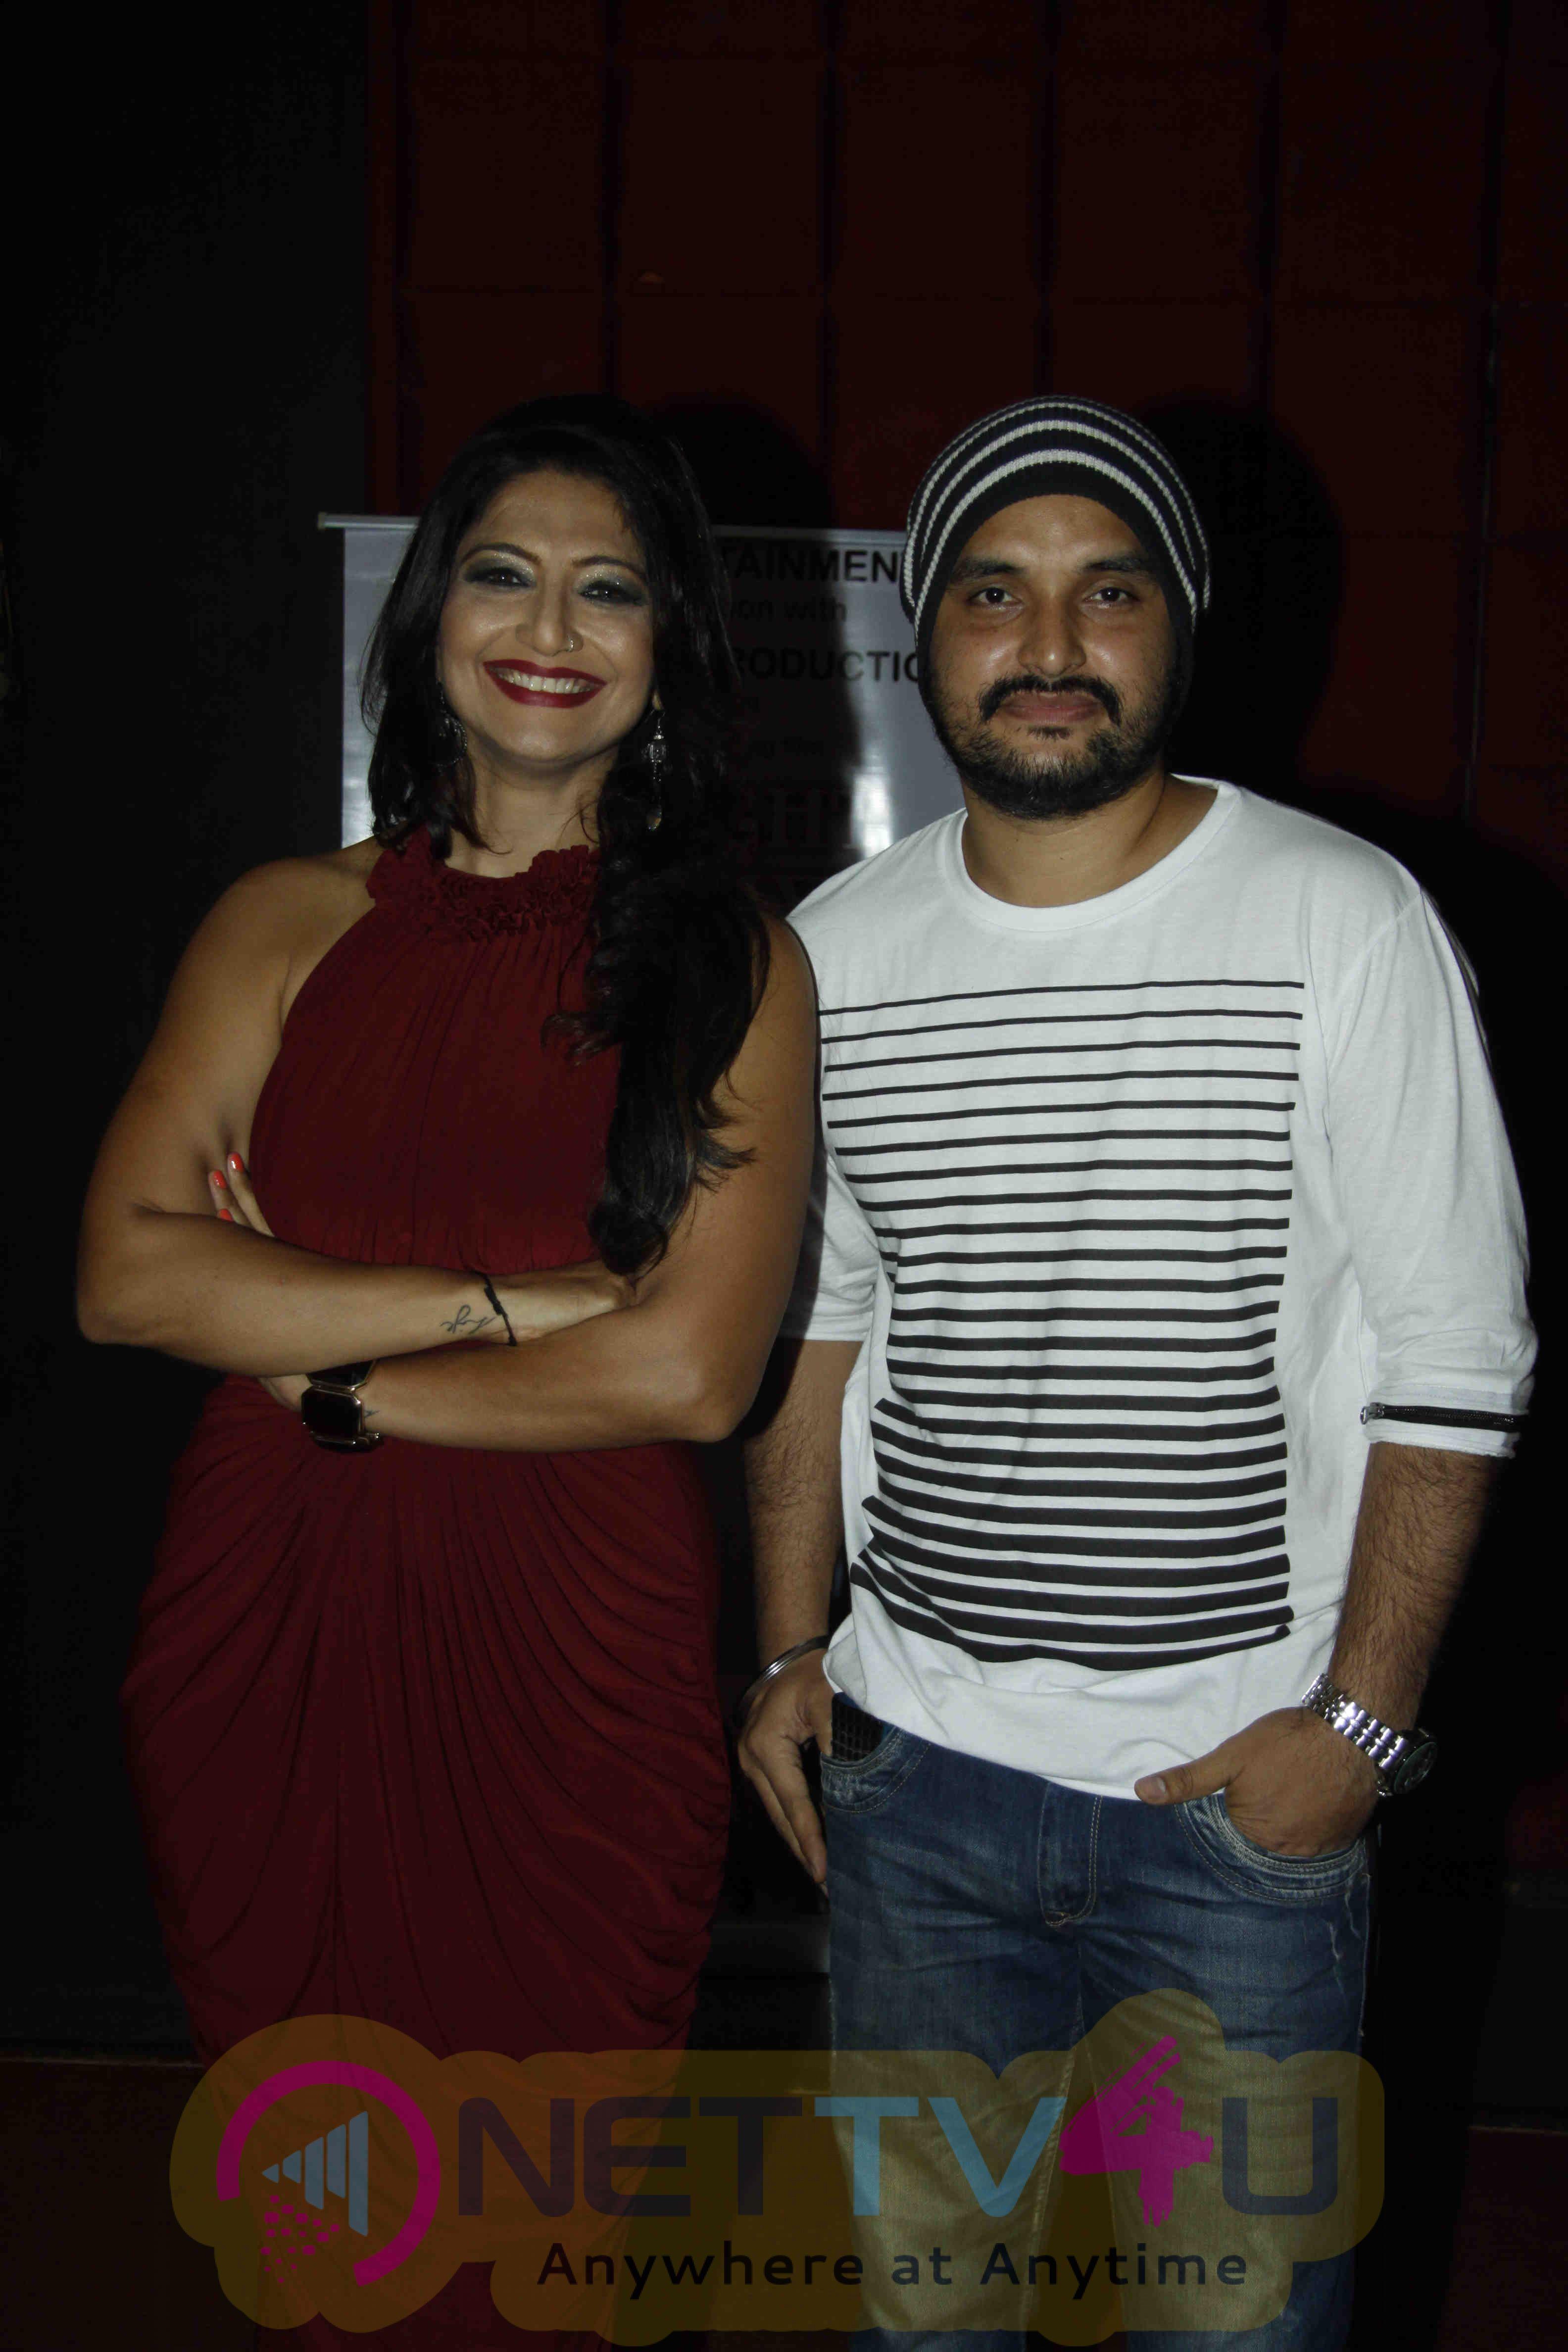 Party to celebrate Aarti Nagpal winning the Dadasaheb Phalke Award Stills Hindi Gallery